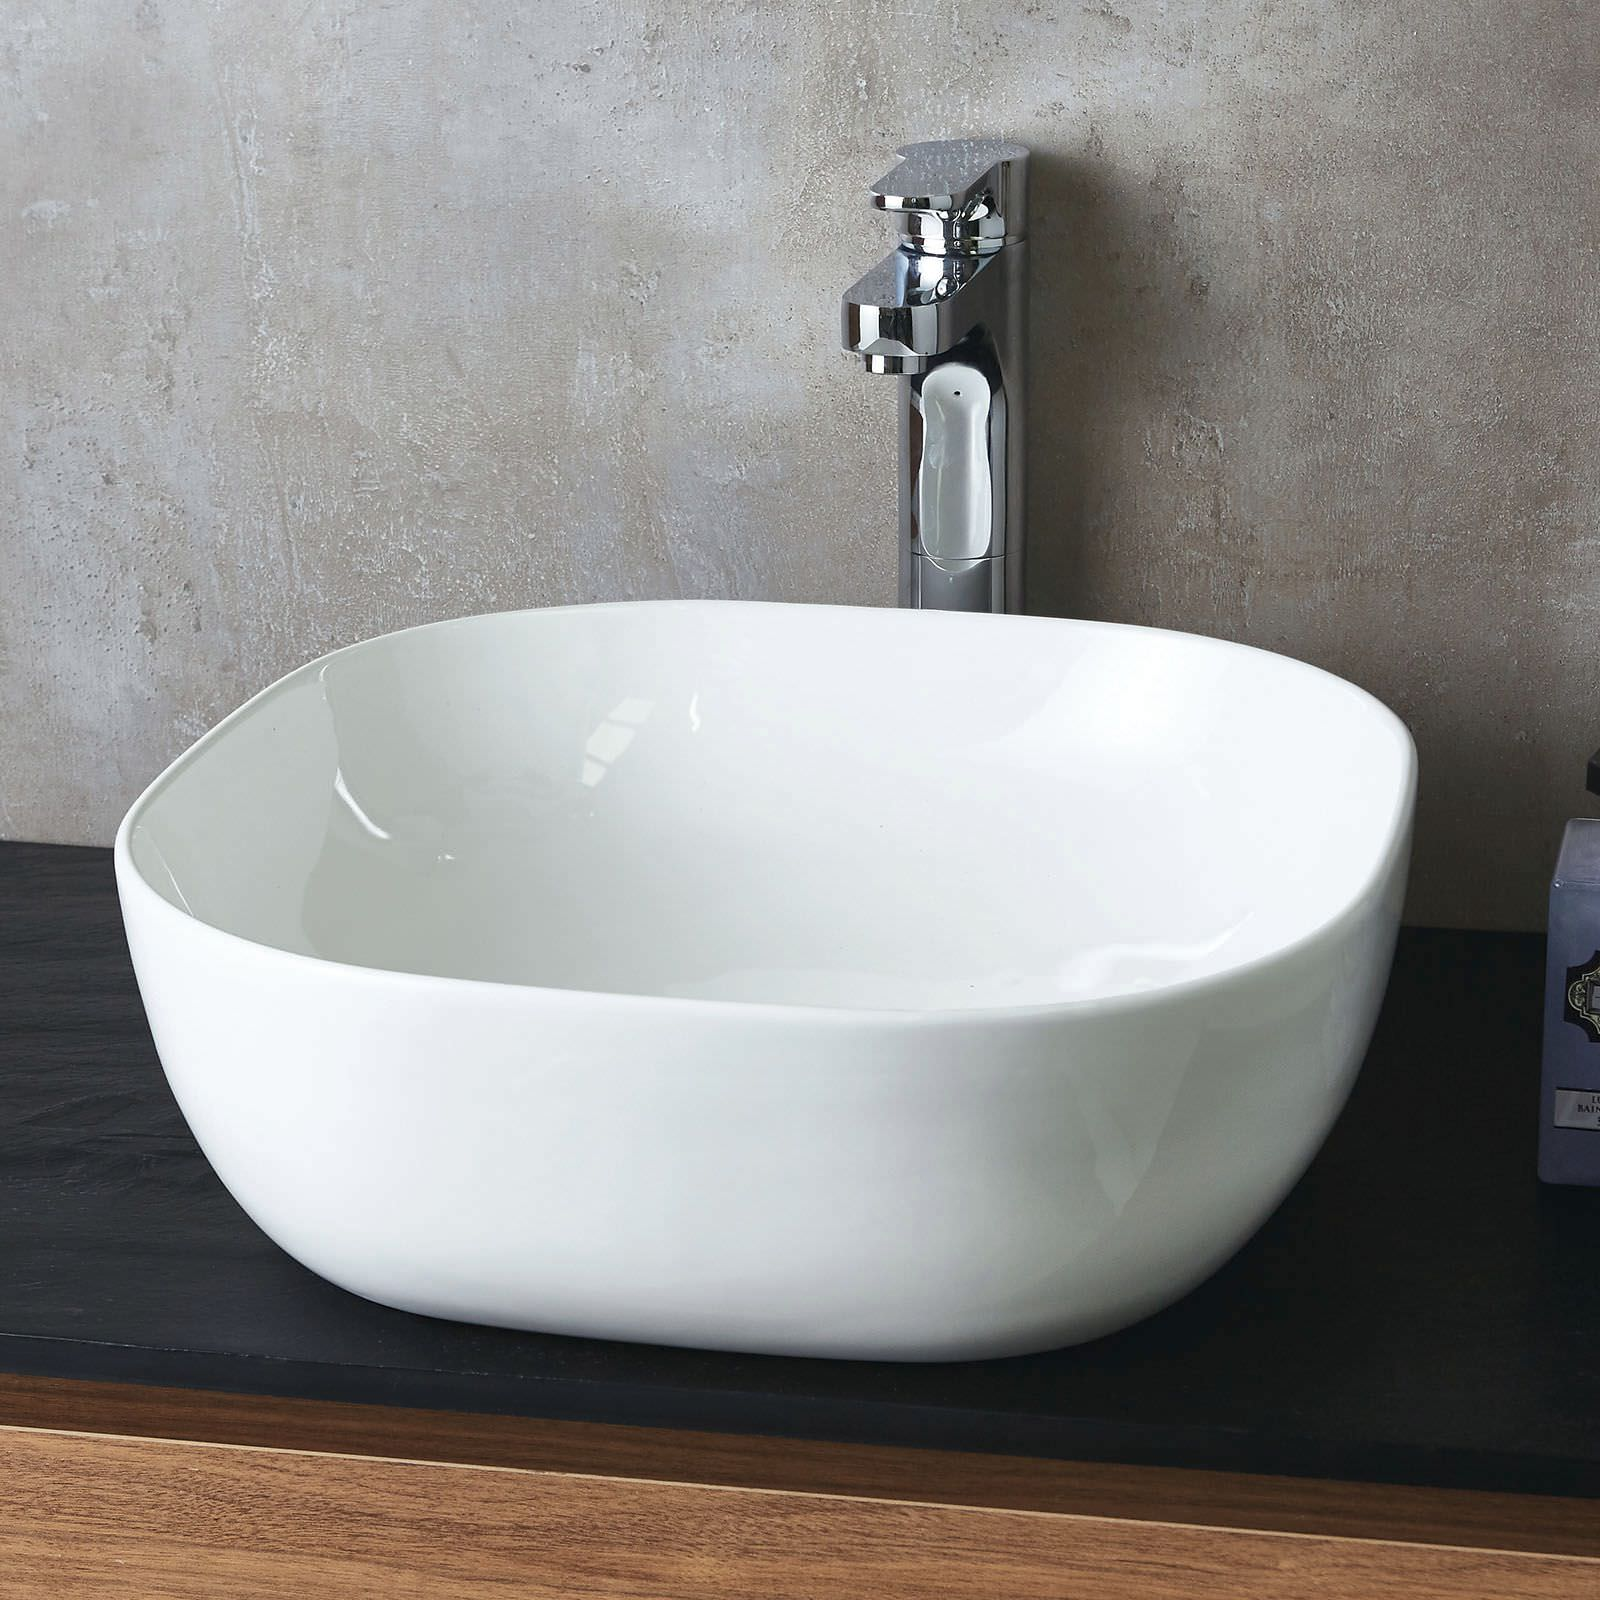 Flat Pack Kitchens >> Phoenix 430mm Square Counter Top Ceramic Basin - VB036